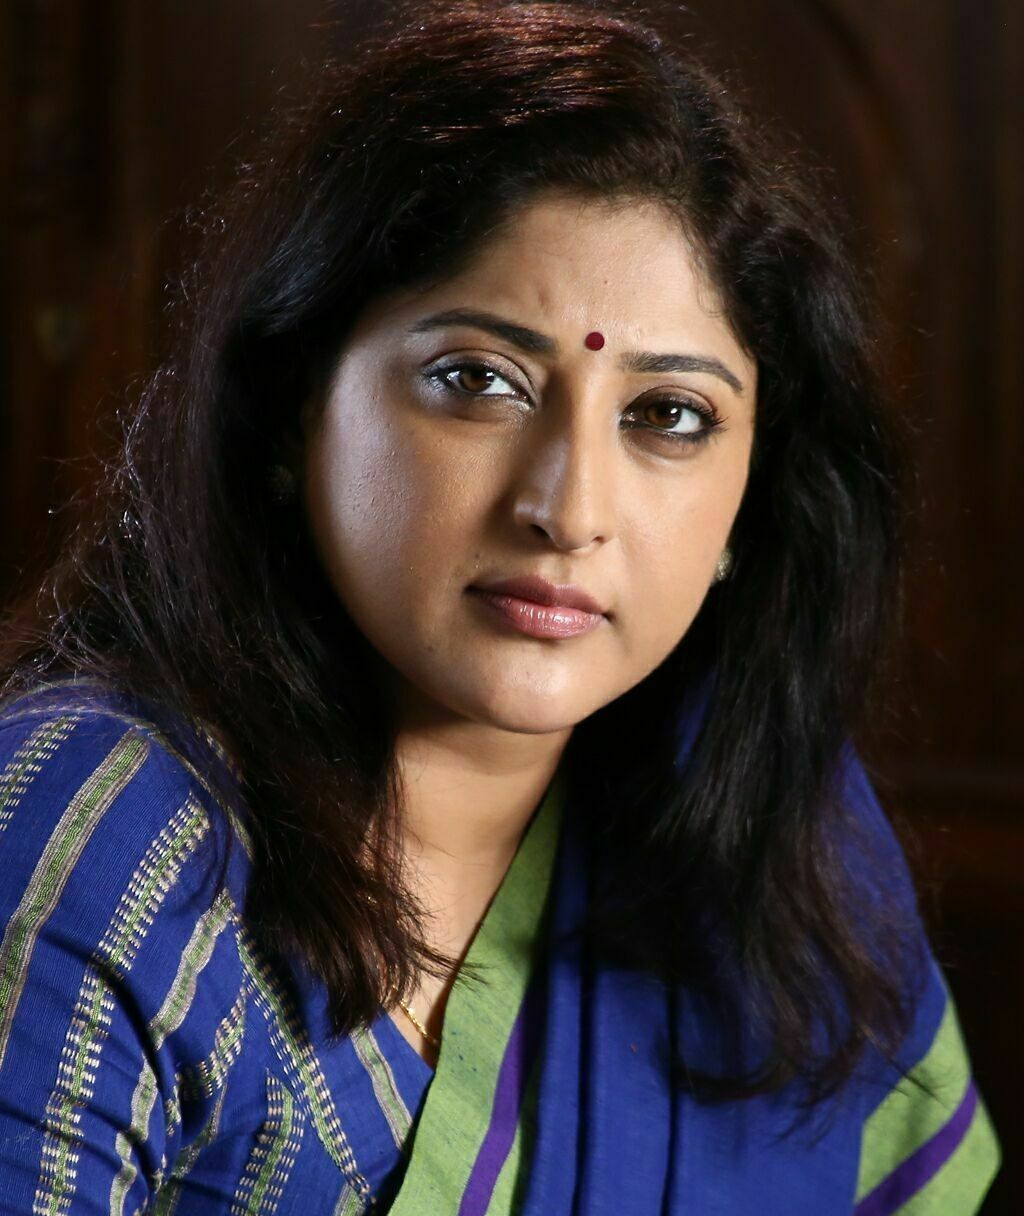 Forum on this topic: Louise Jameson (born 1951), lakshmi-gopalaswamy/